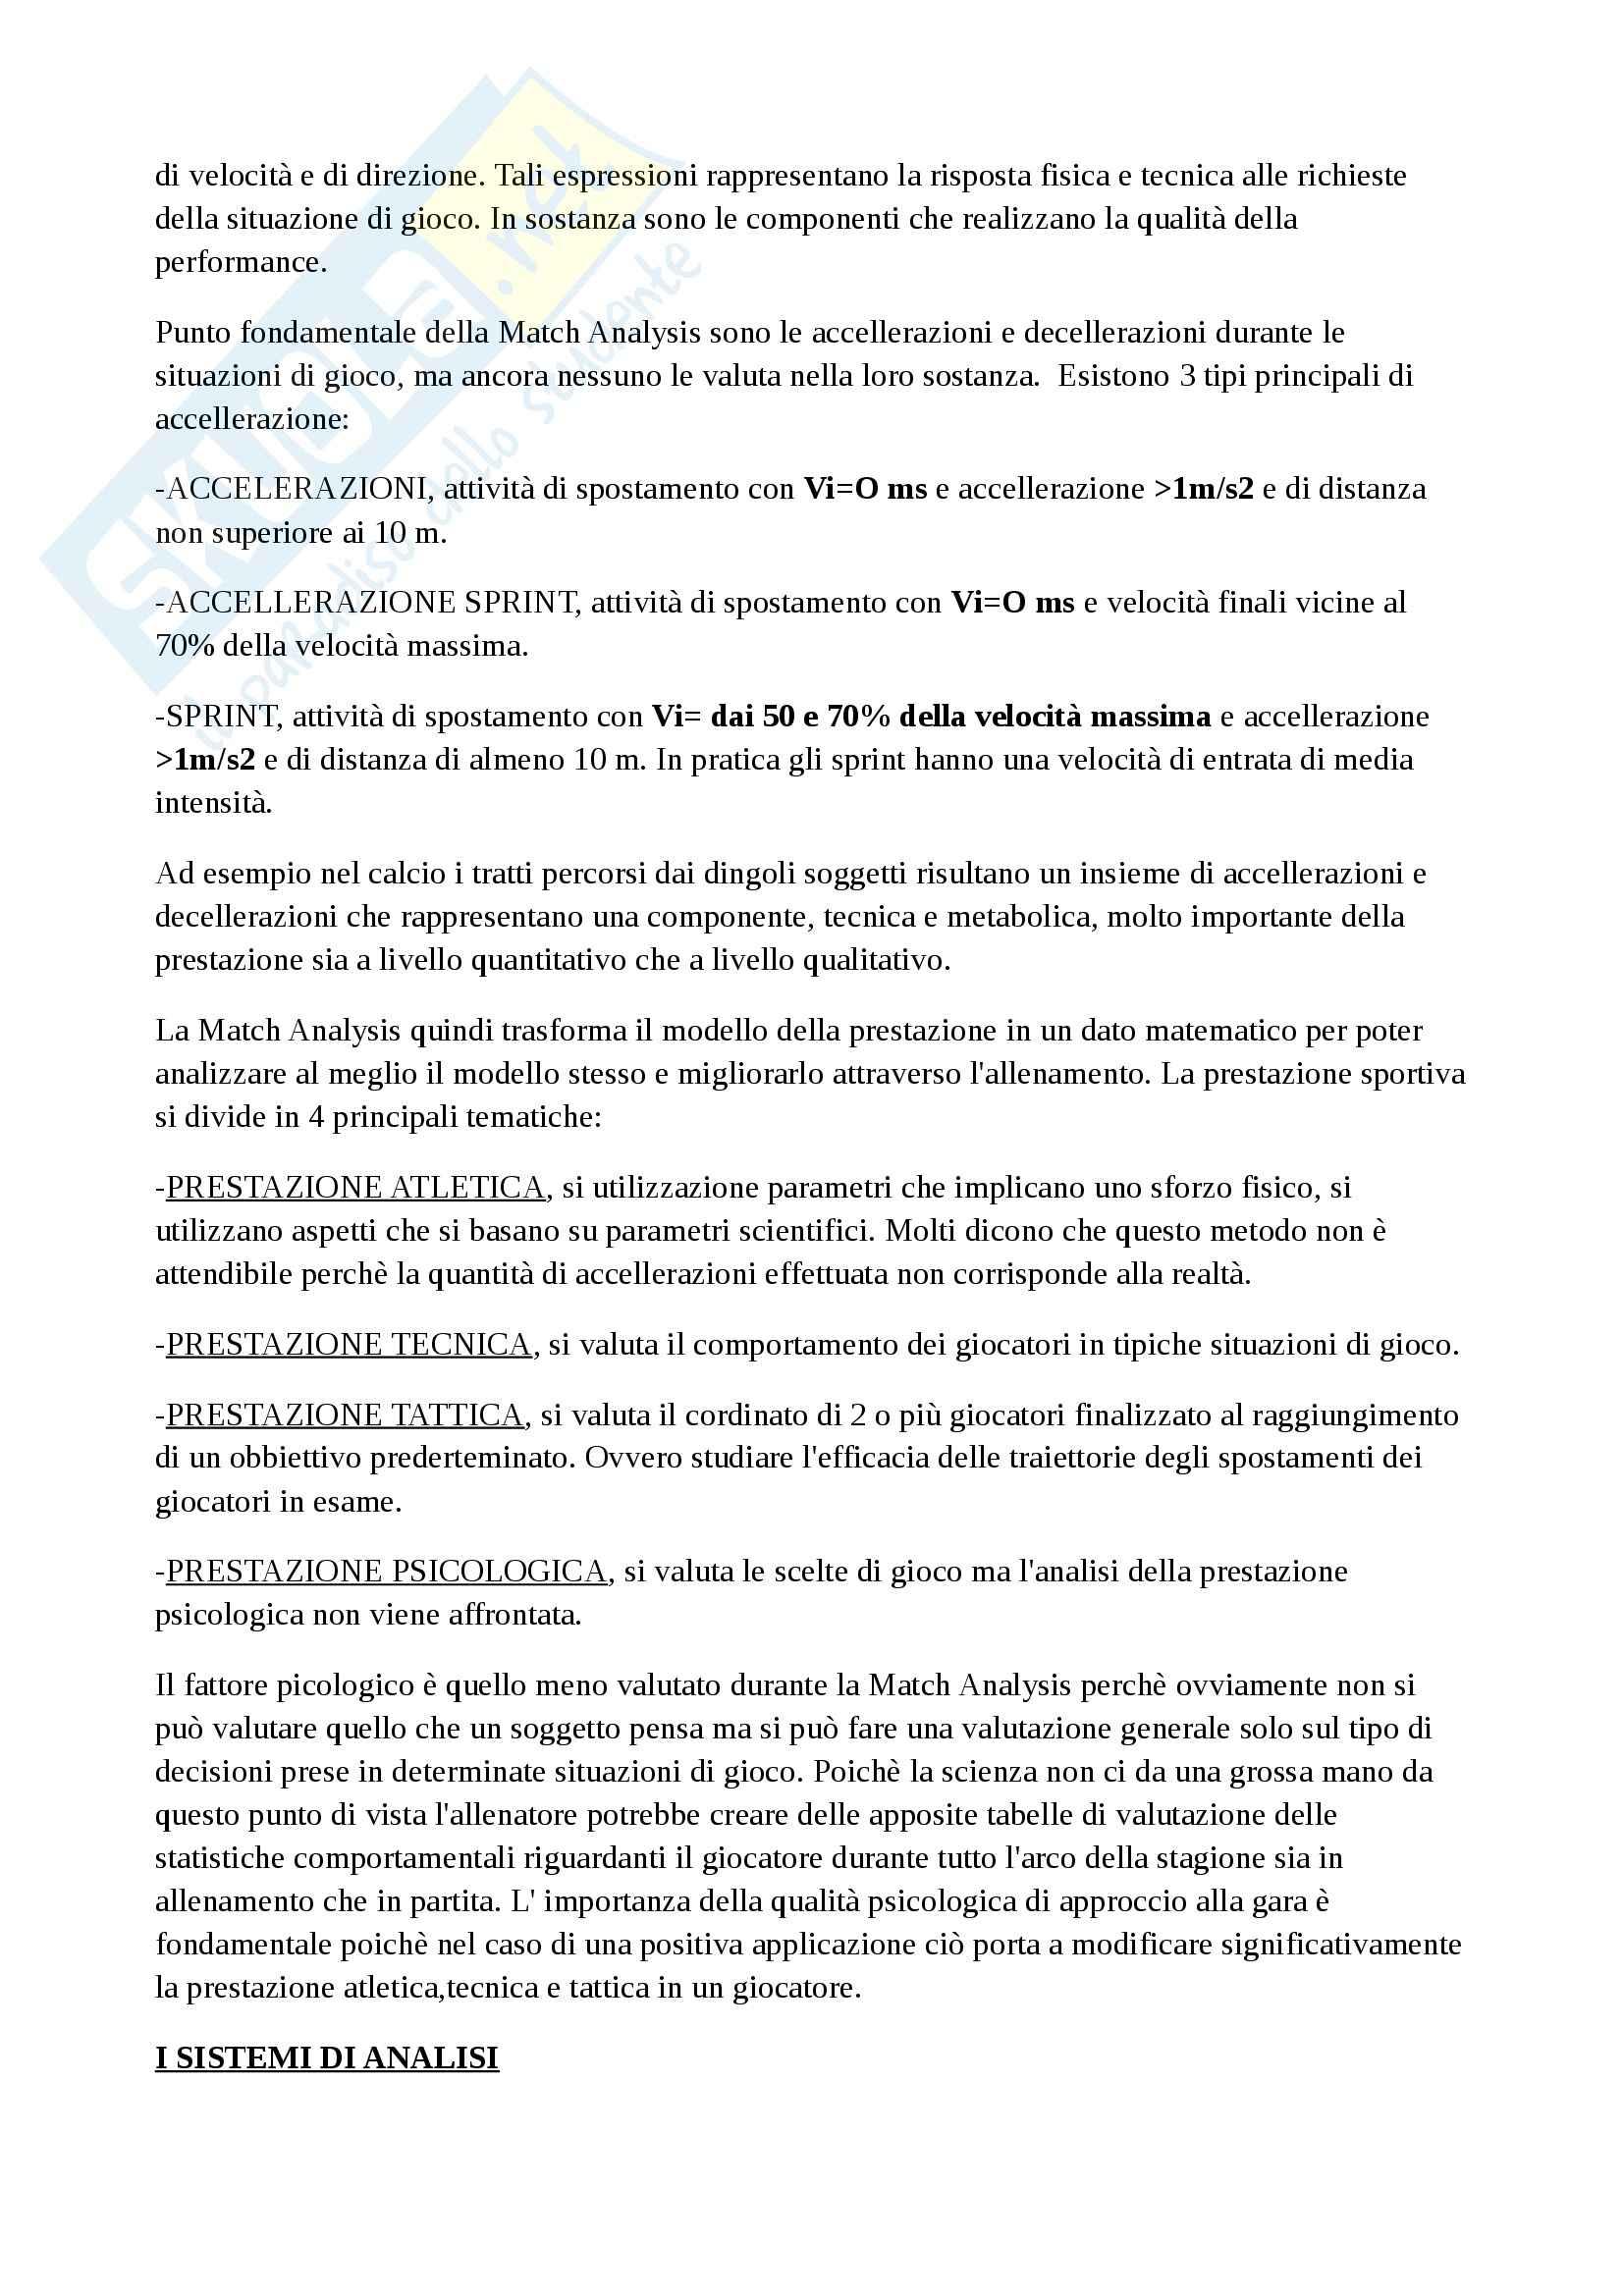 Analisi Della Performance Sportiva - Match analysis Pag. 2